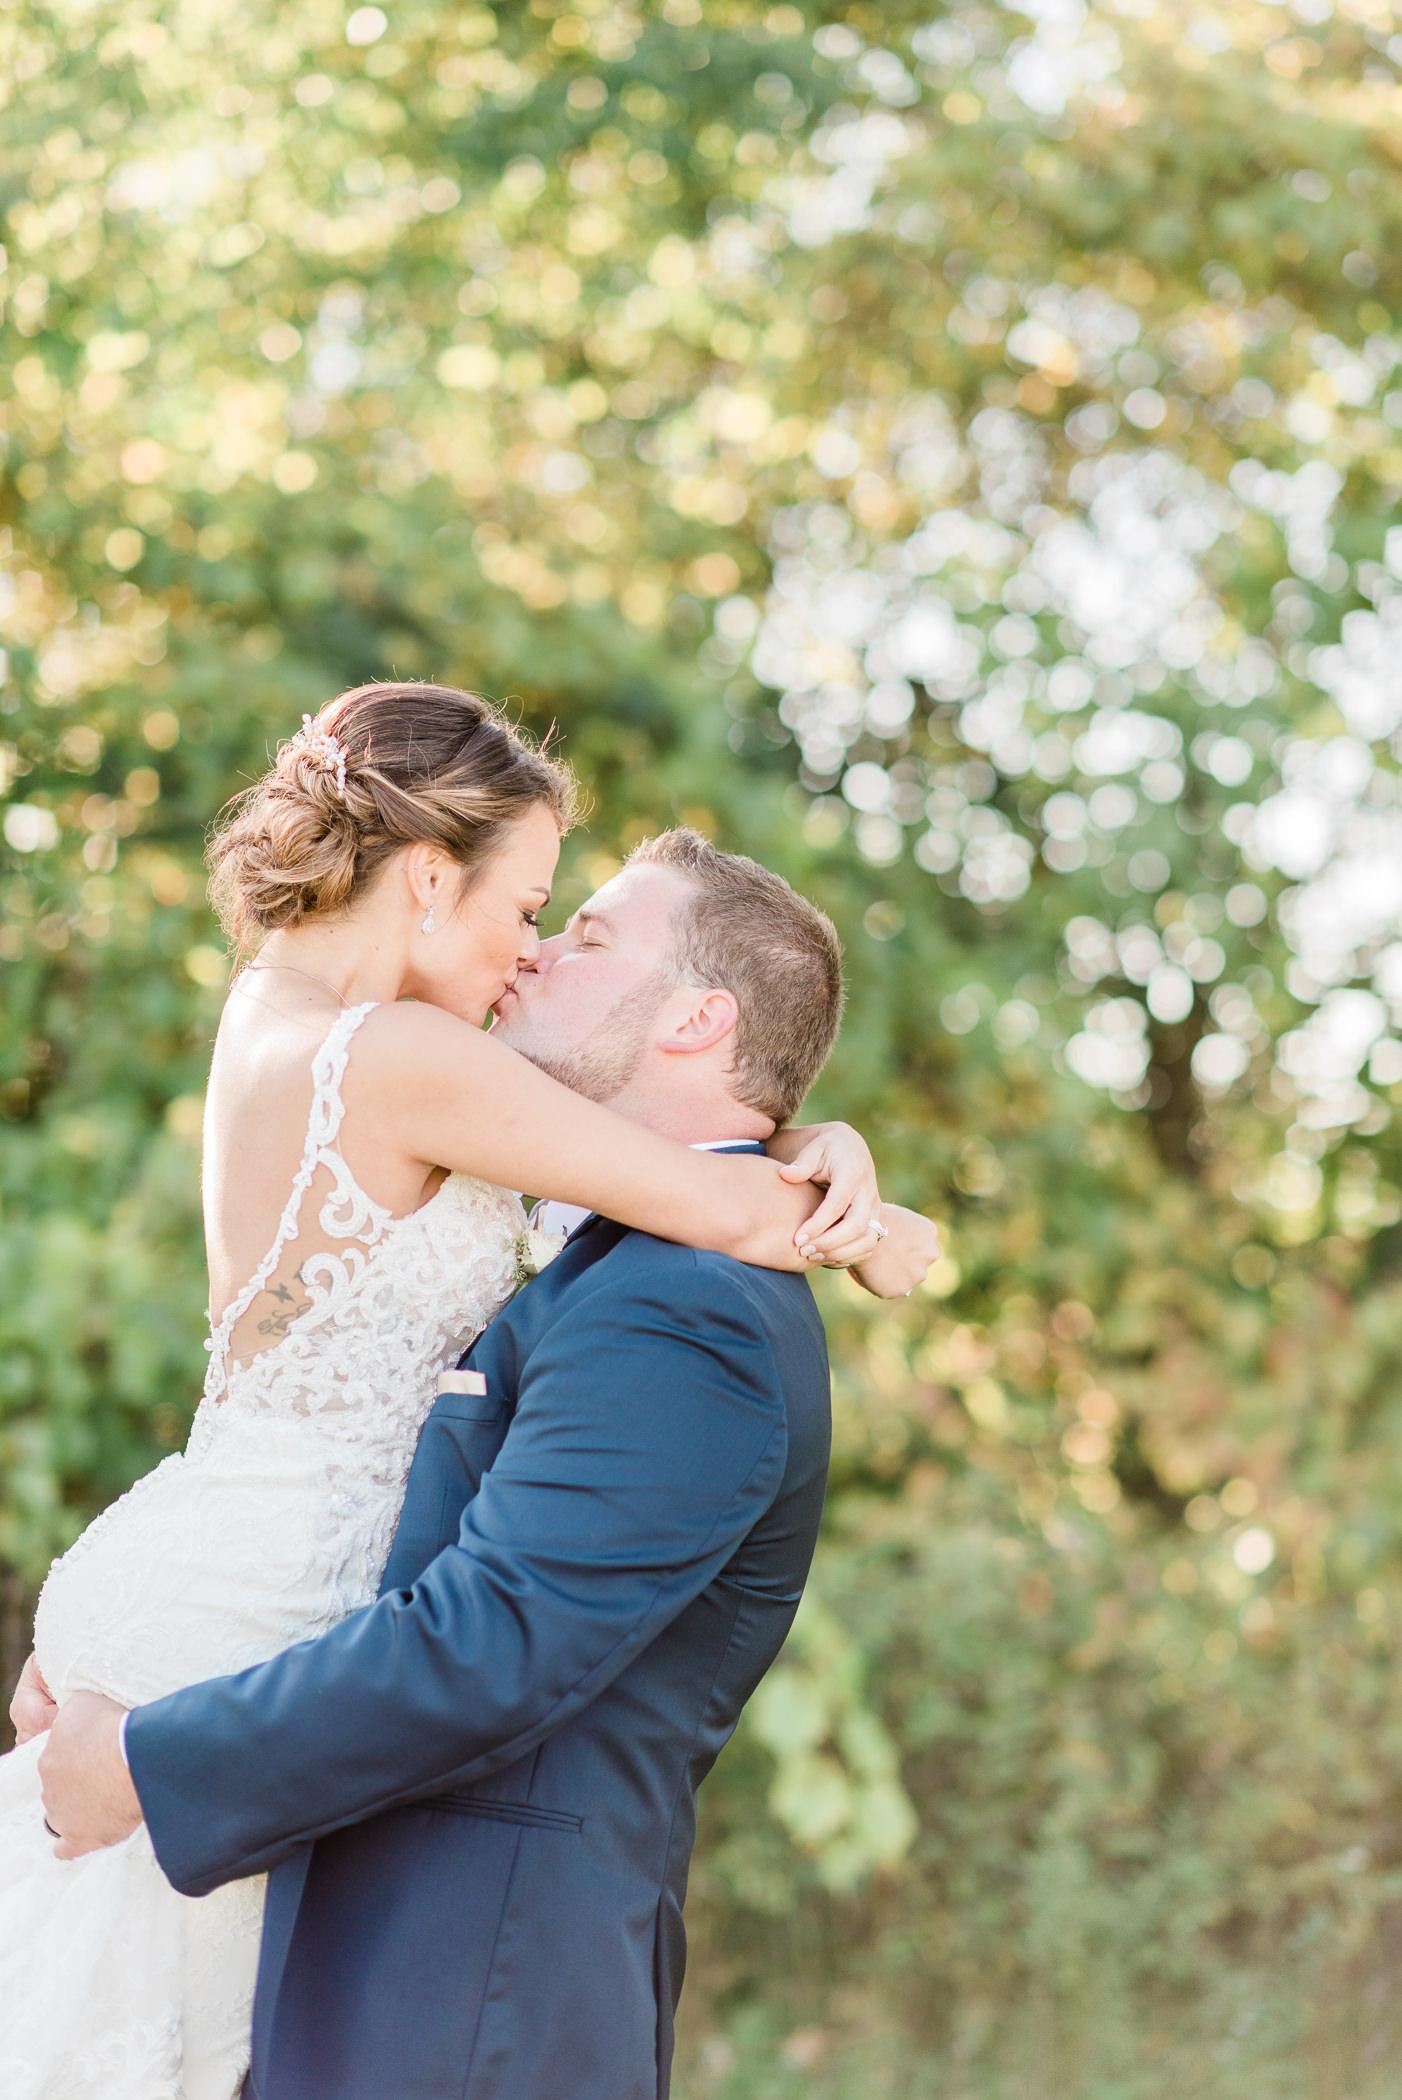 Terrace 167 Wedding Photographer - Larissa Marie Photography